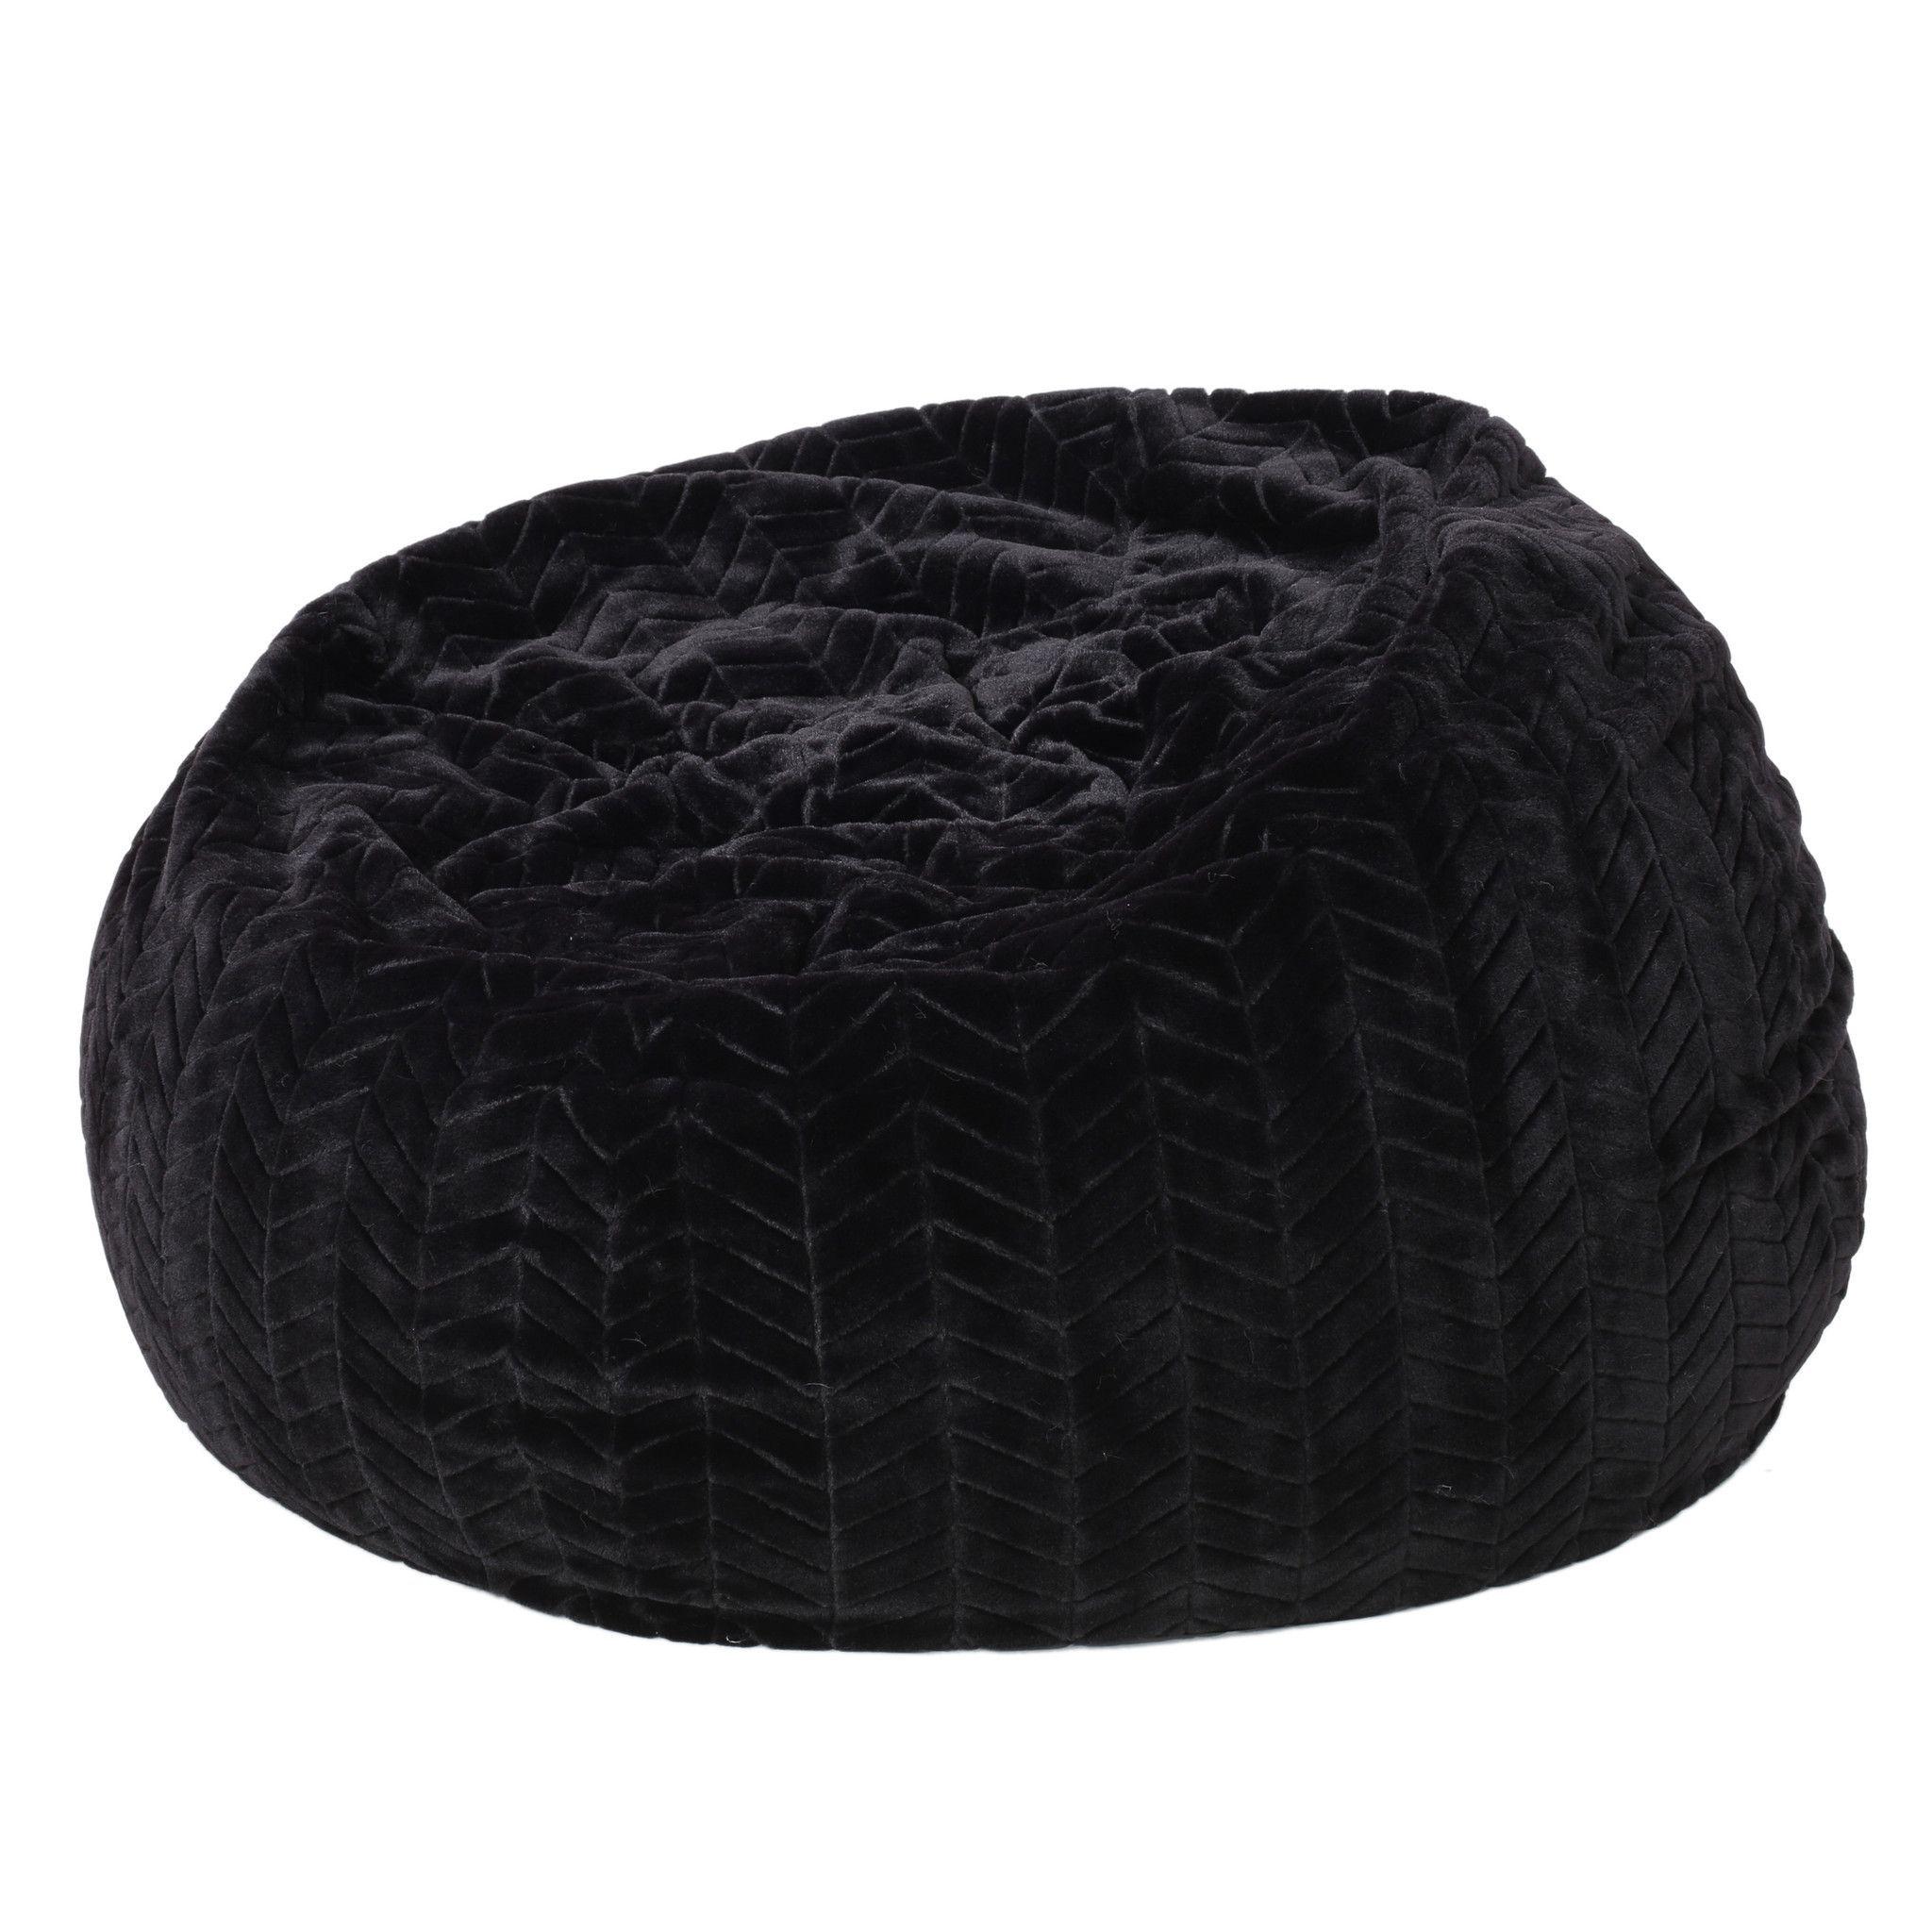 Teal Faux Fur Saucer Chair Beach Towel Clips Canada Meridian Black Fabric Bean Bag In 2019 New House